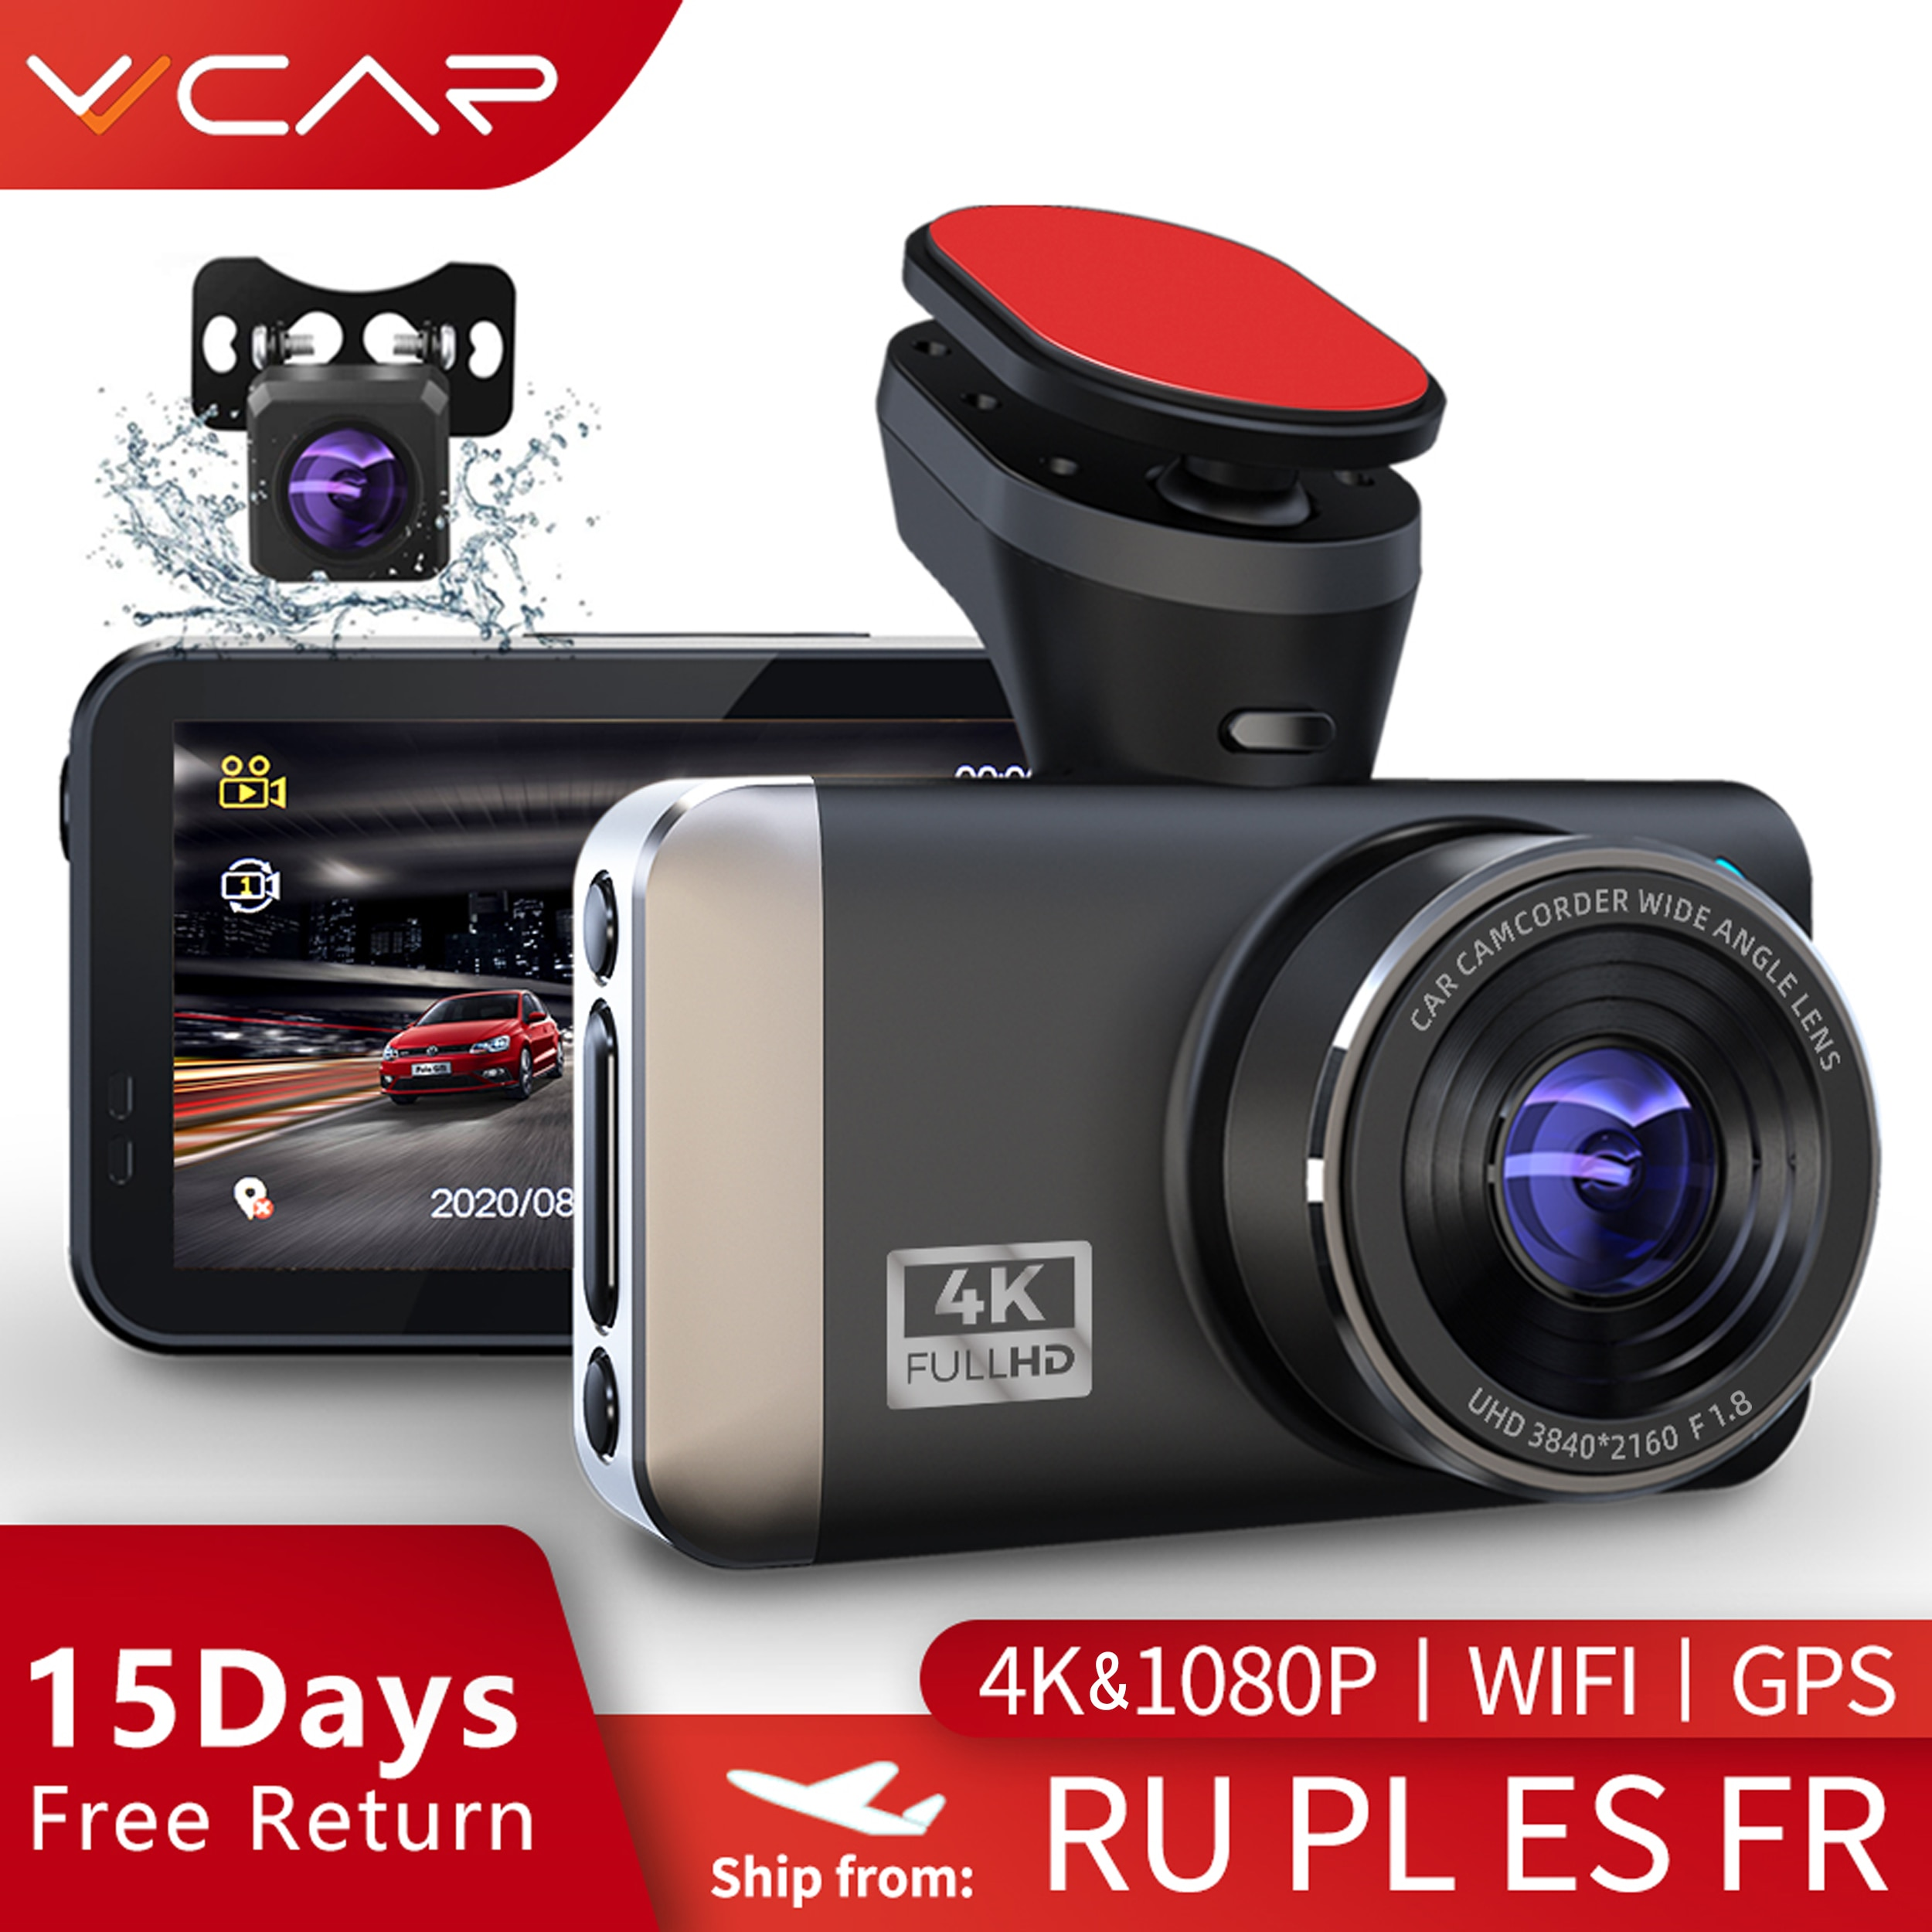 VVCAR D530 جهاز تسجيل فيديو رقمي للسيارات كاميرا 4K + 1080P واي فاي سرعة N نظام تحديد المواقع داشكام داش كام سيارة مسجل سبور للرؤية الليلية